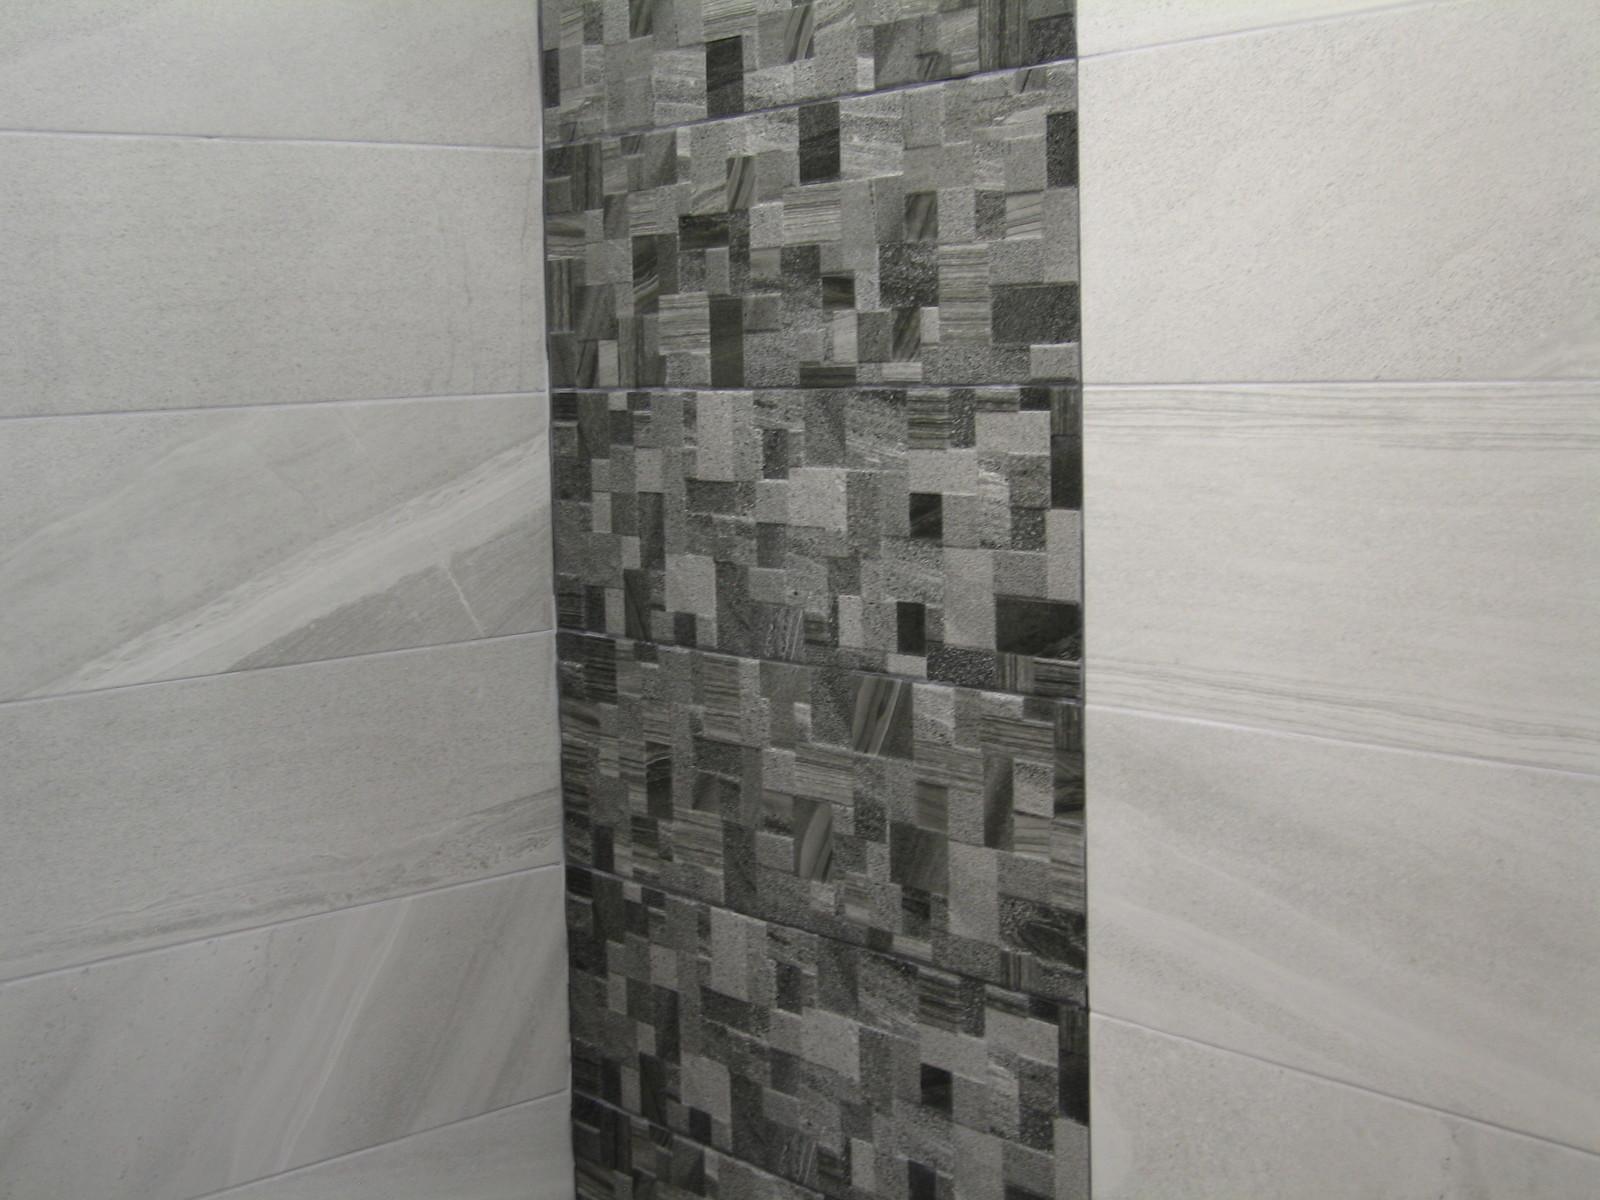 Glory Glazed Ceramic Stone Effect Wall Tiles DIY Bathroom ...